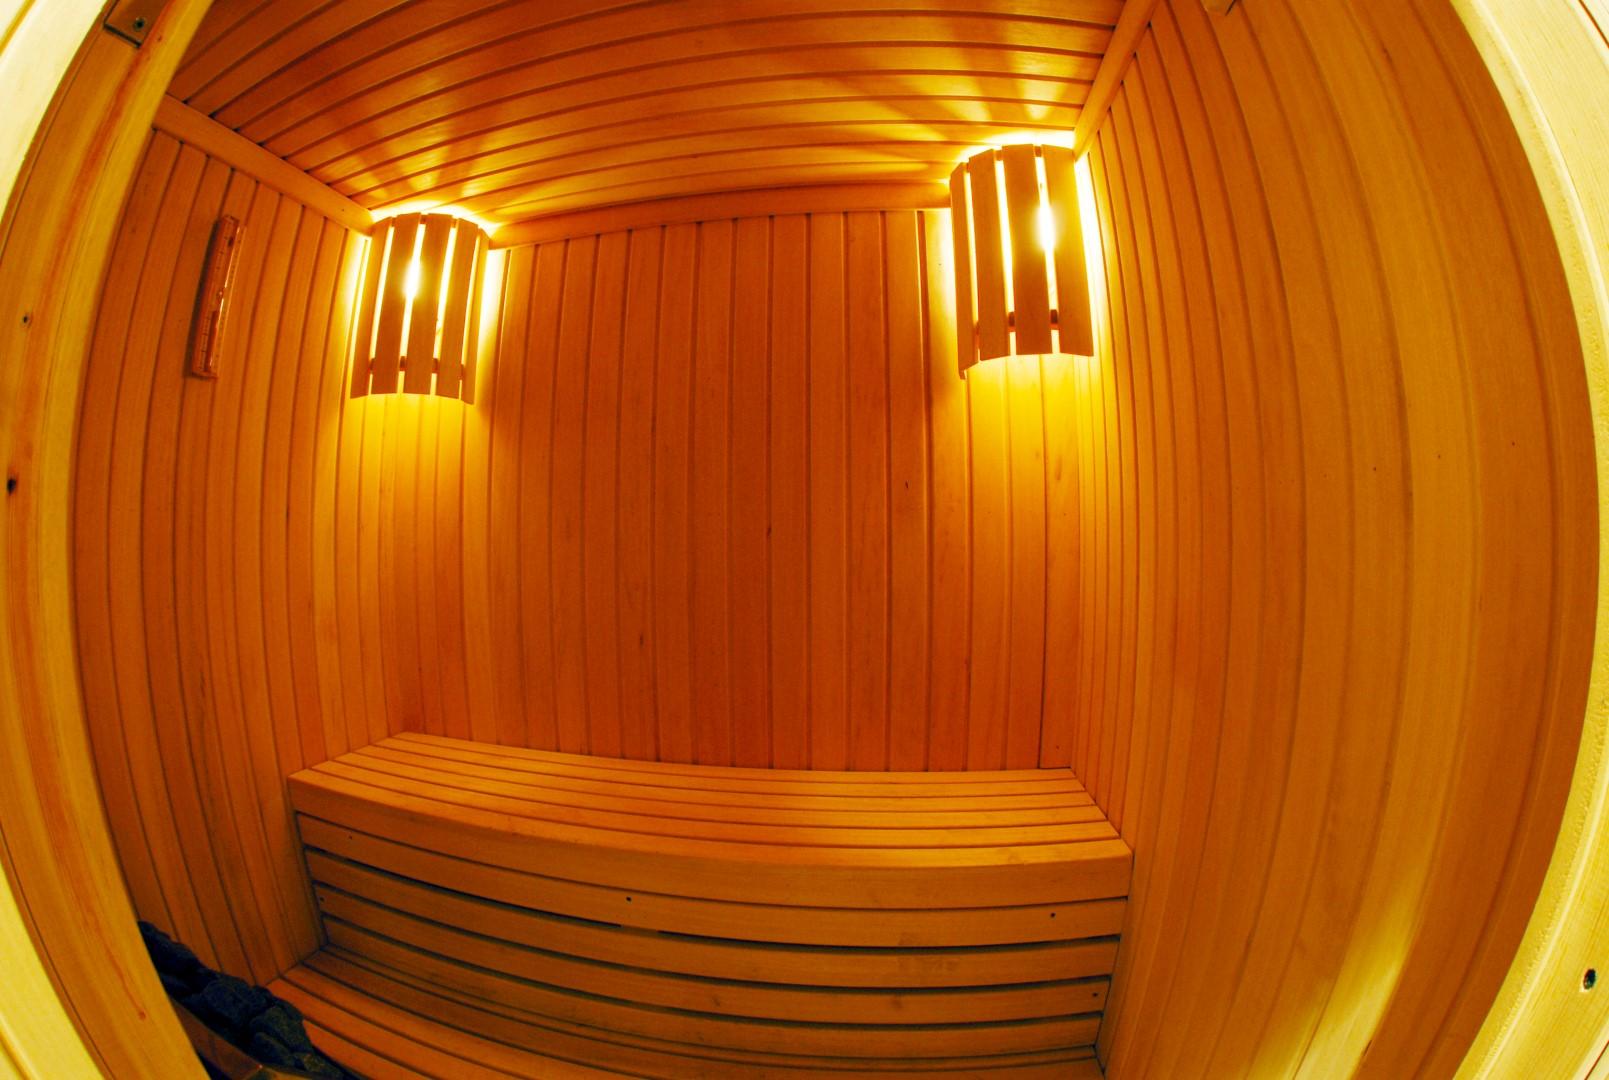 http://alliwansuites.com.qa/suites/wp-content/uploads/2016/06/Sauna-Steam.jpg